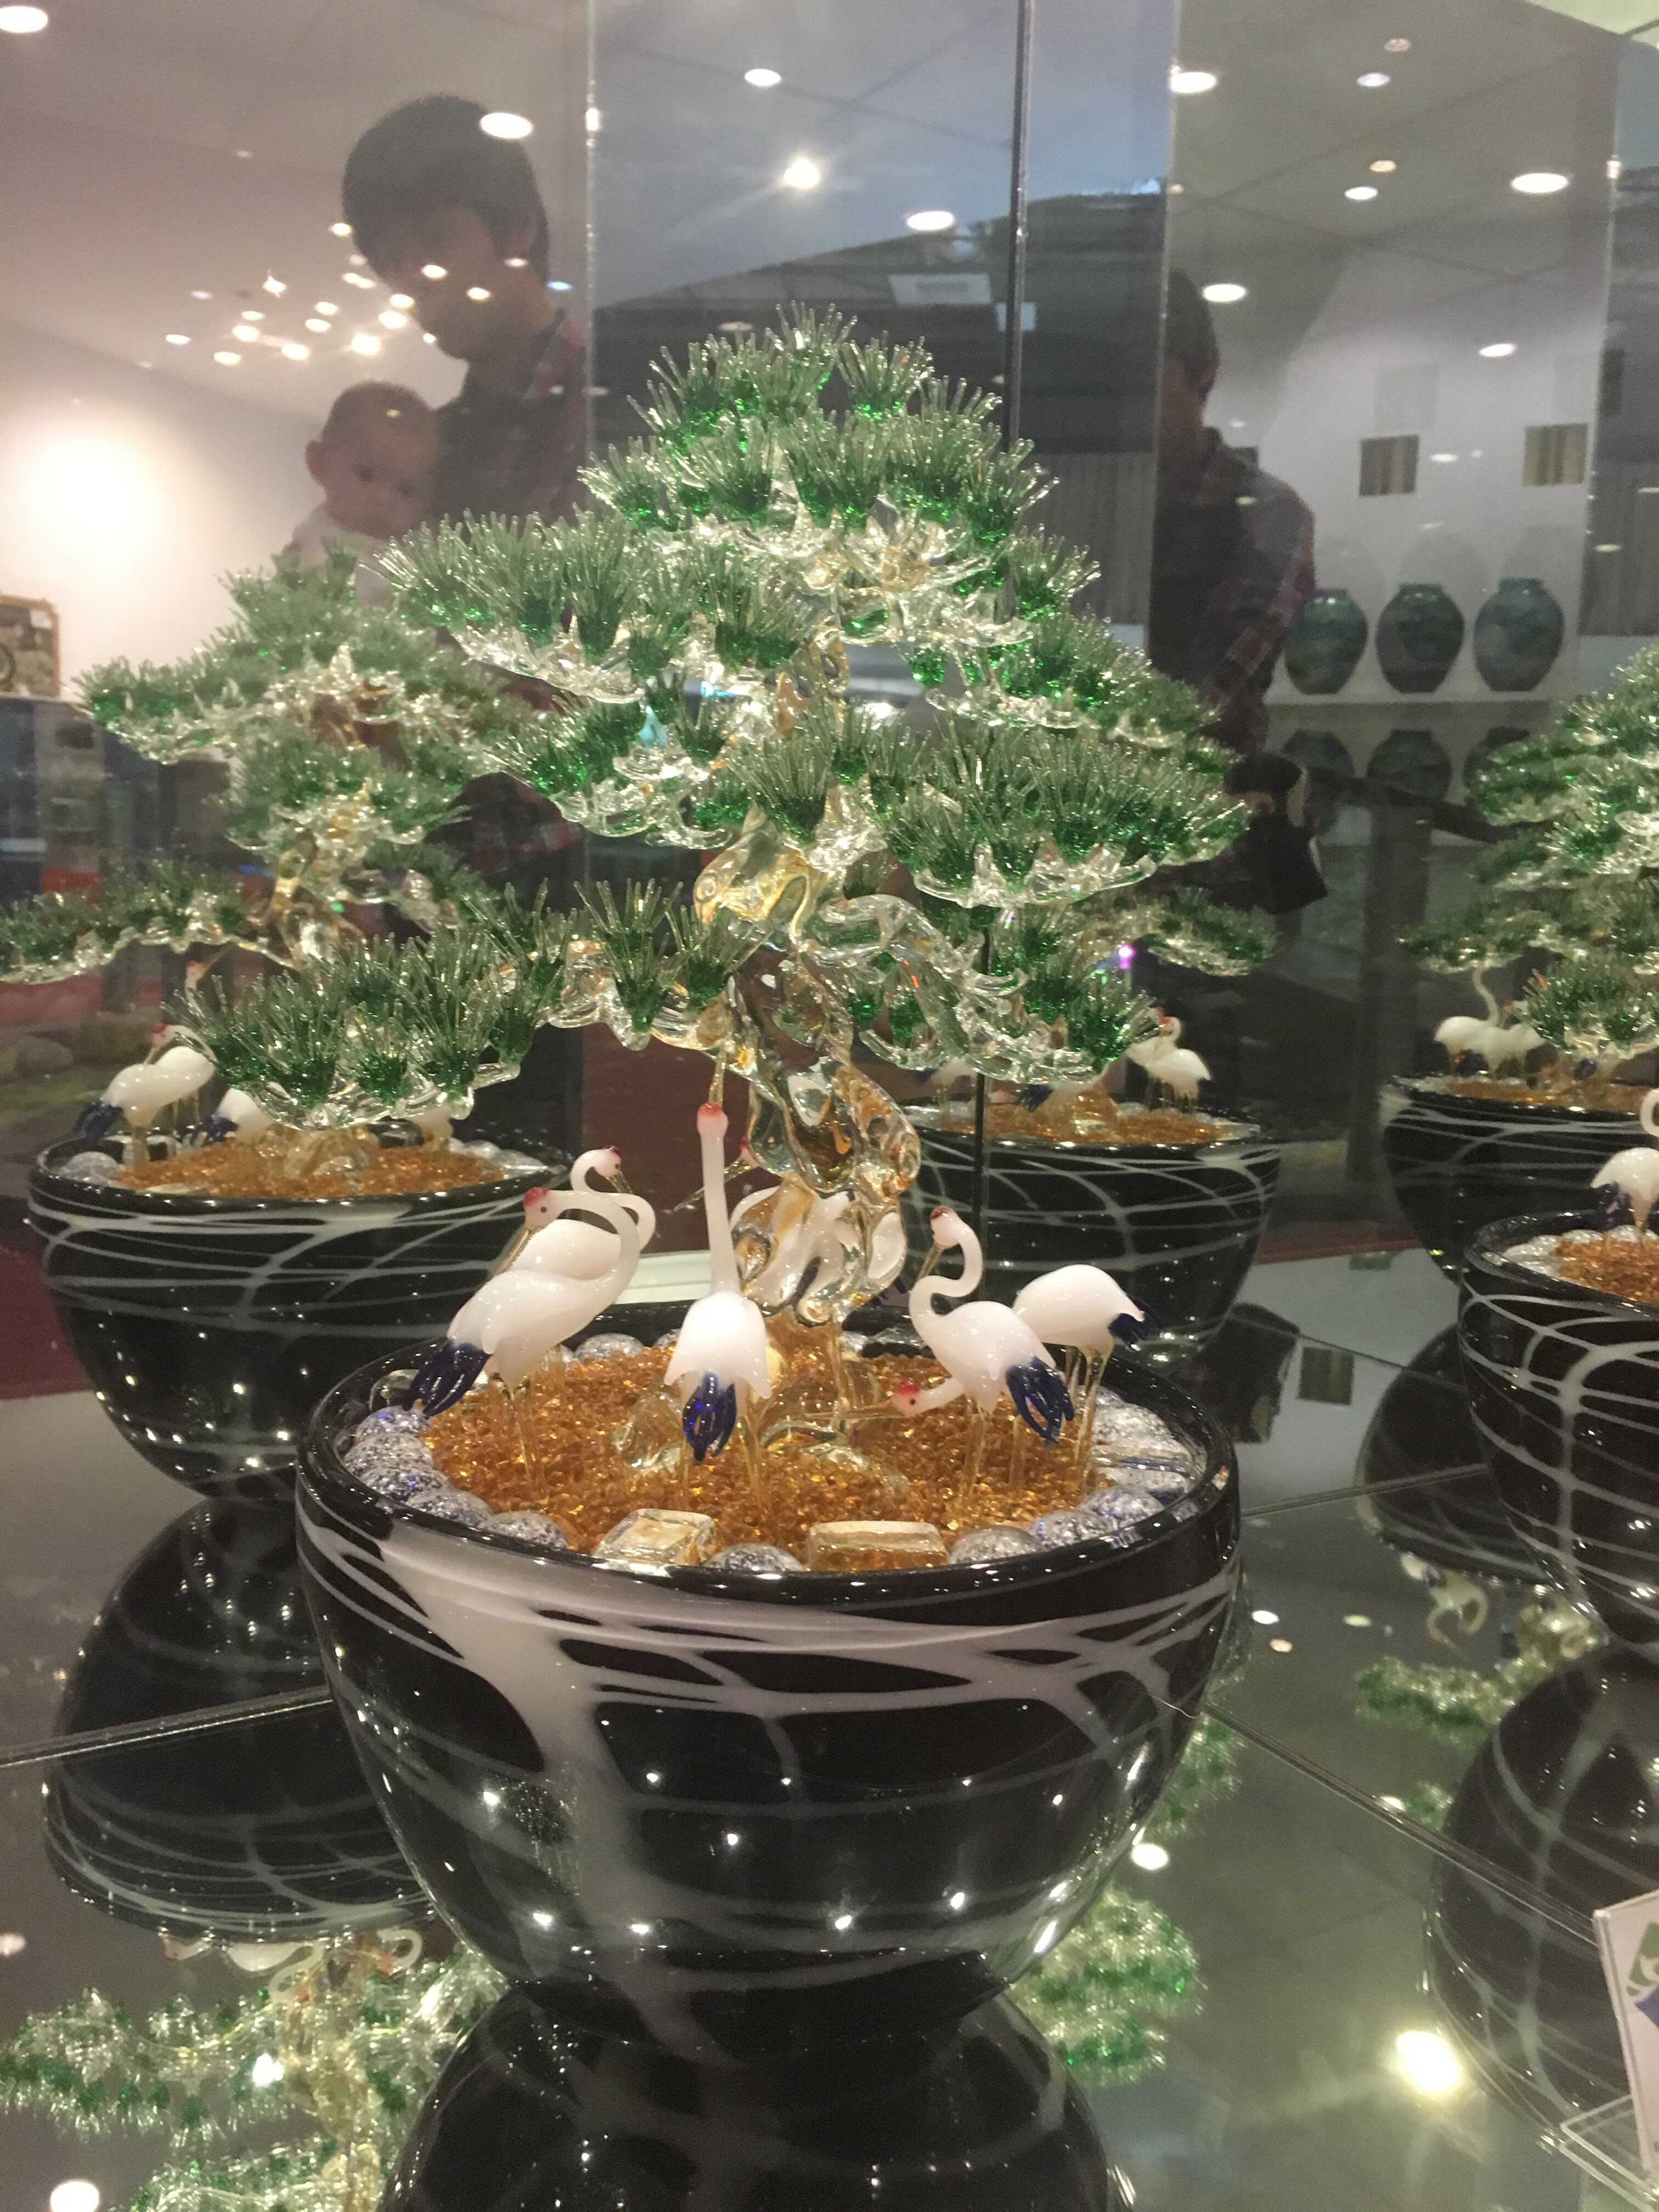 lukang changhua Taiwan glass gallery glass temple